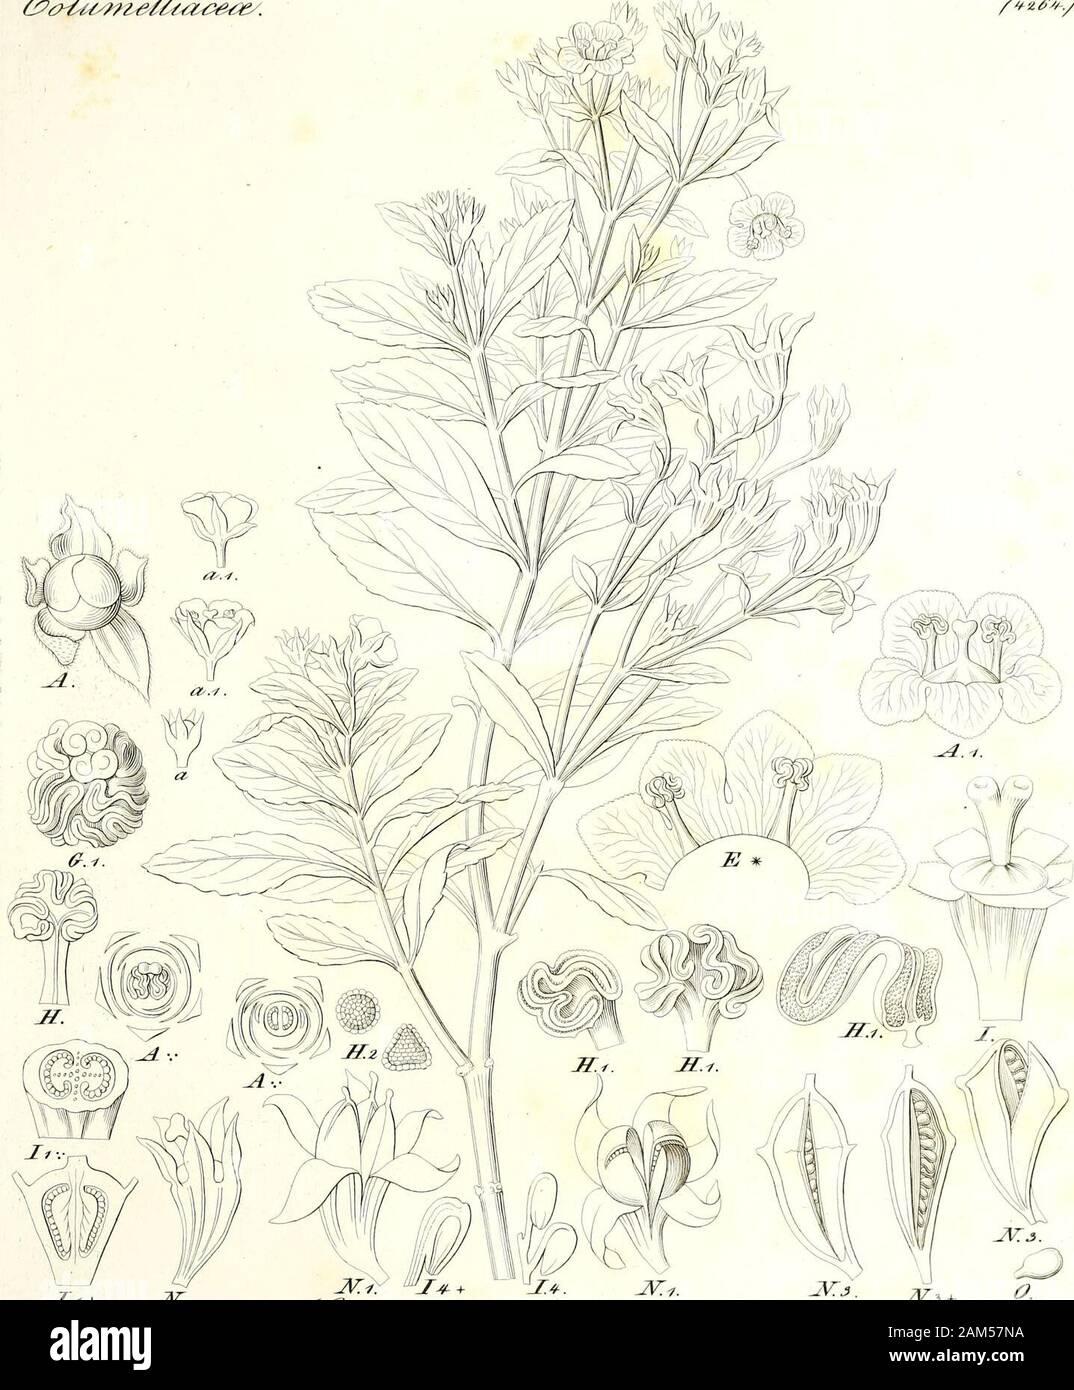 Iconographia generum plantarum . J>&6Suz^-=Fj &- /a3 J . &0i>U49t06U. .Z/ + Jr.    JV.i. ^> + JE+. JV.1. JVj Sffjs/LO^-fs a Js+J Hedyotideas./G-??*?/ Stock Photo